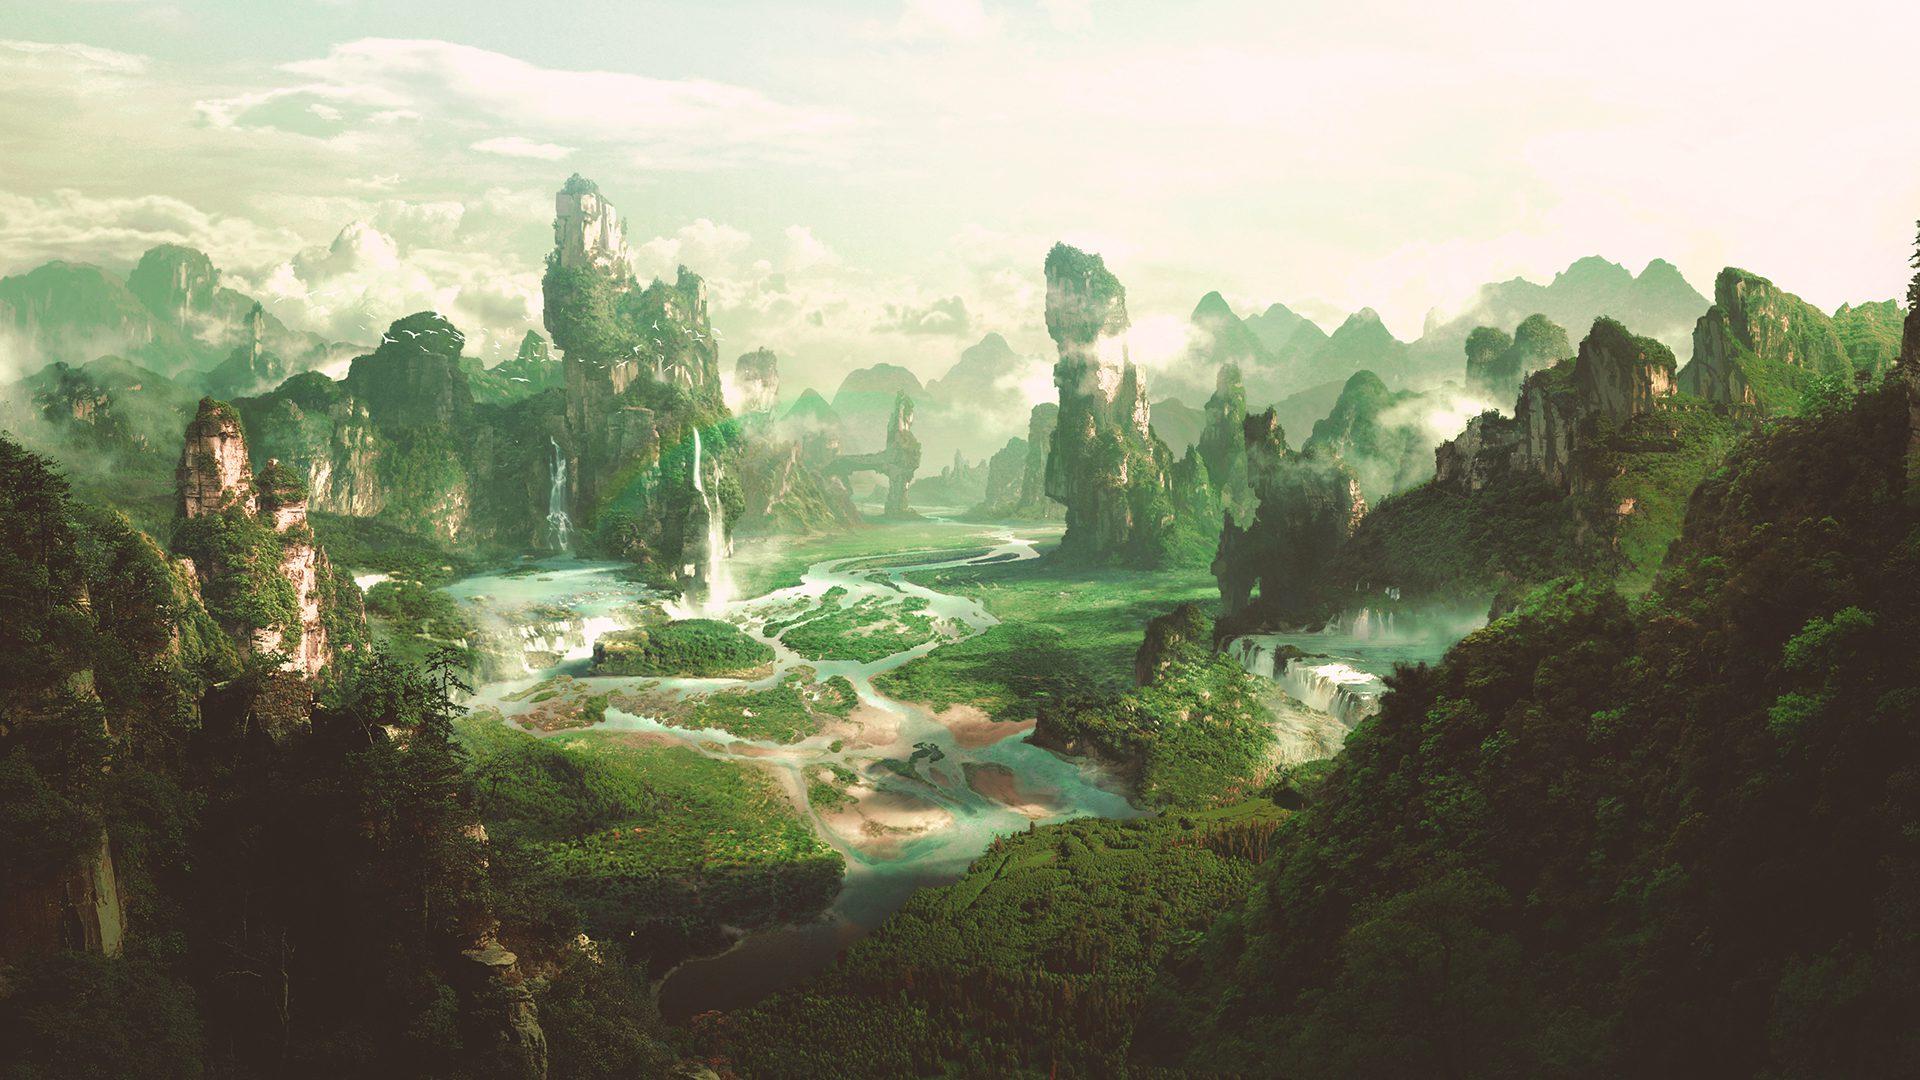 Landscape matte painting of alien world for VFX shots